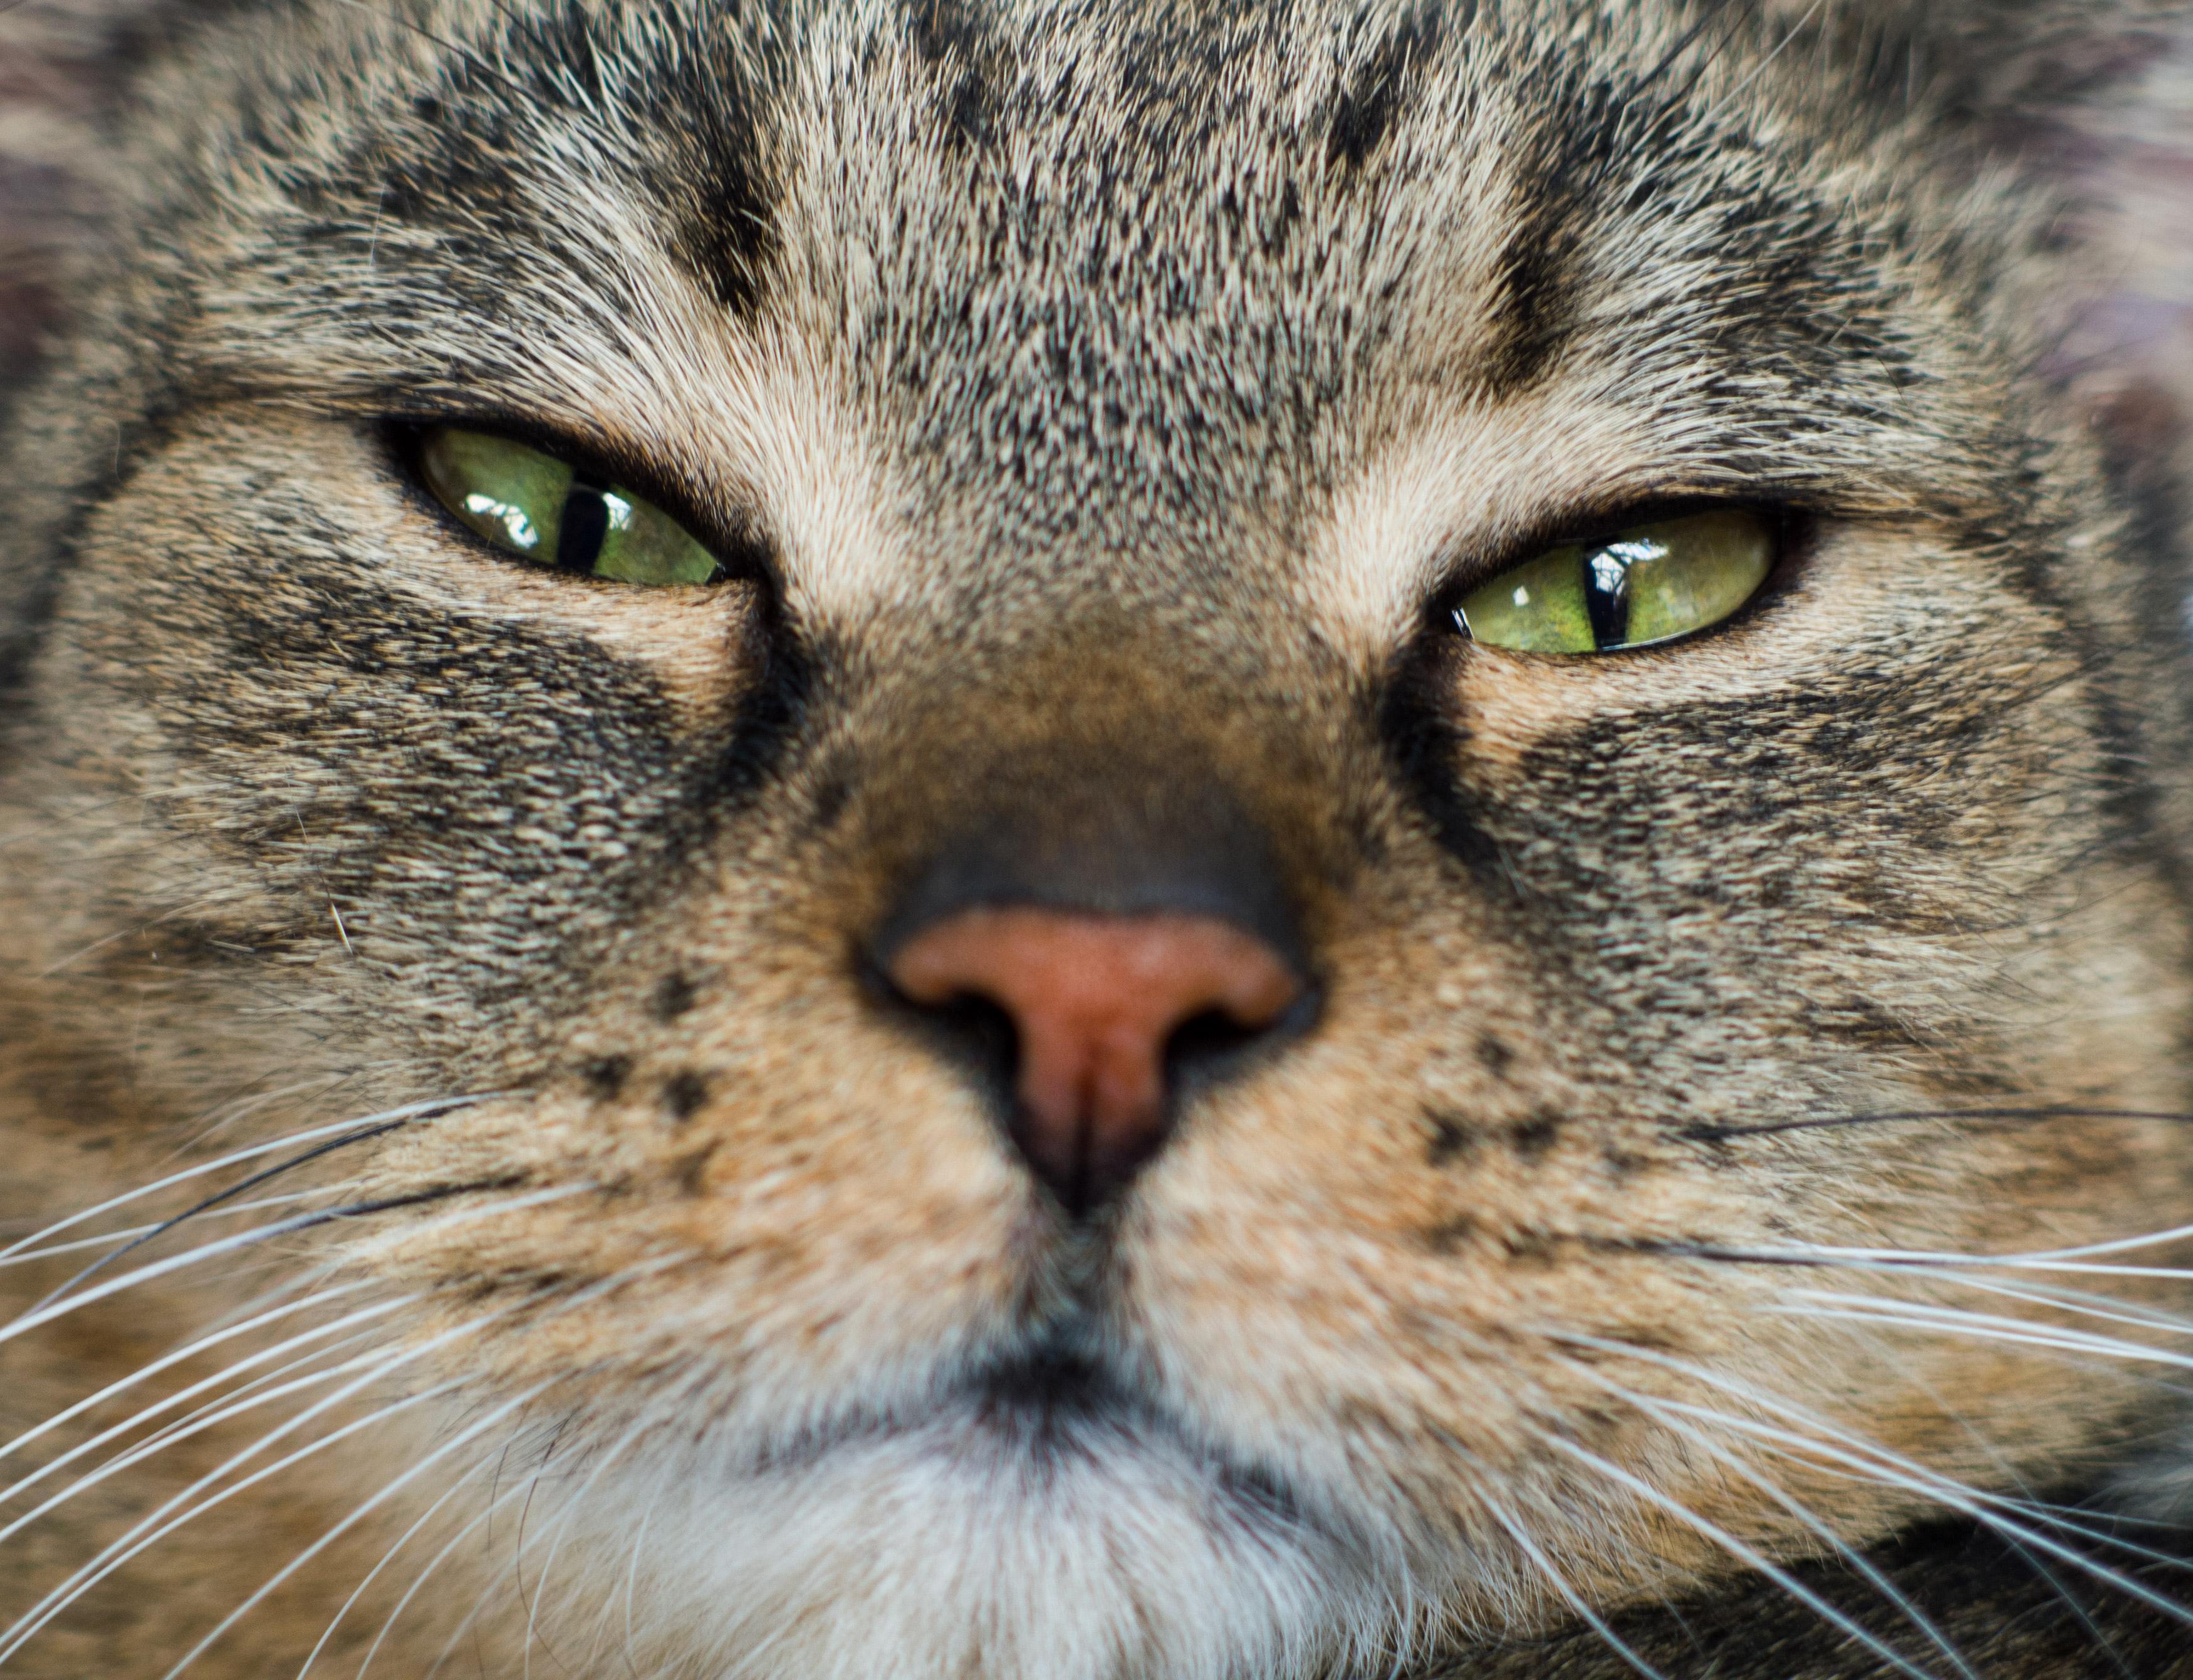 Cat S Face Close Up Free Stock Photo Libreshot